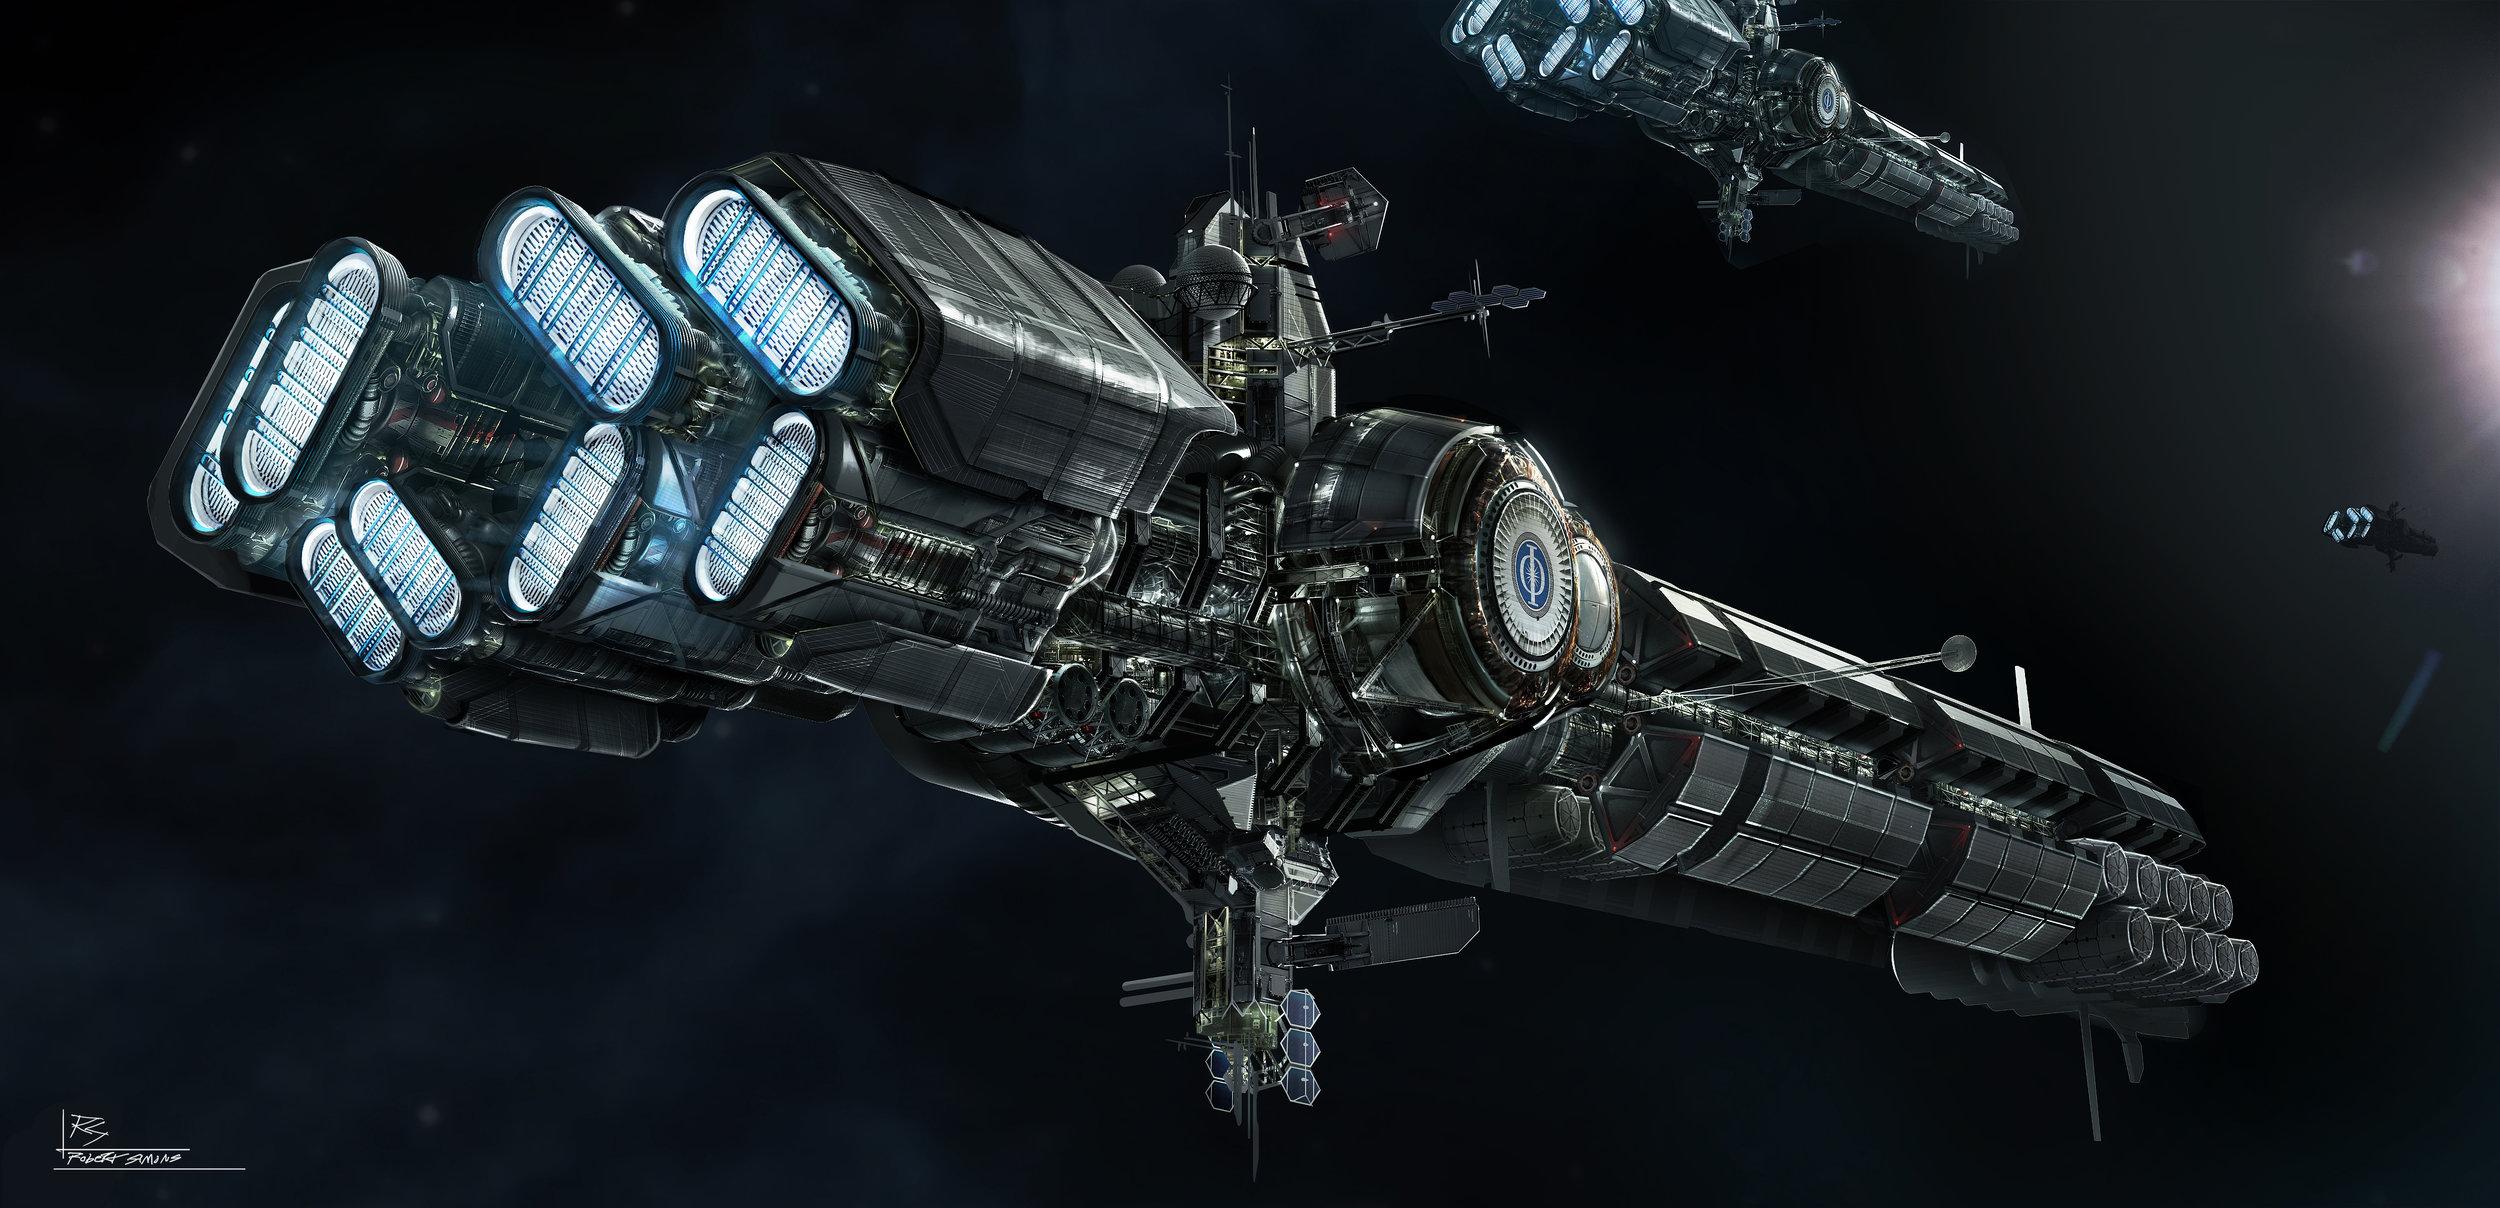 BS_InterstellarTranspo_Ilo_120118_Hero_RS.jpg